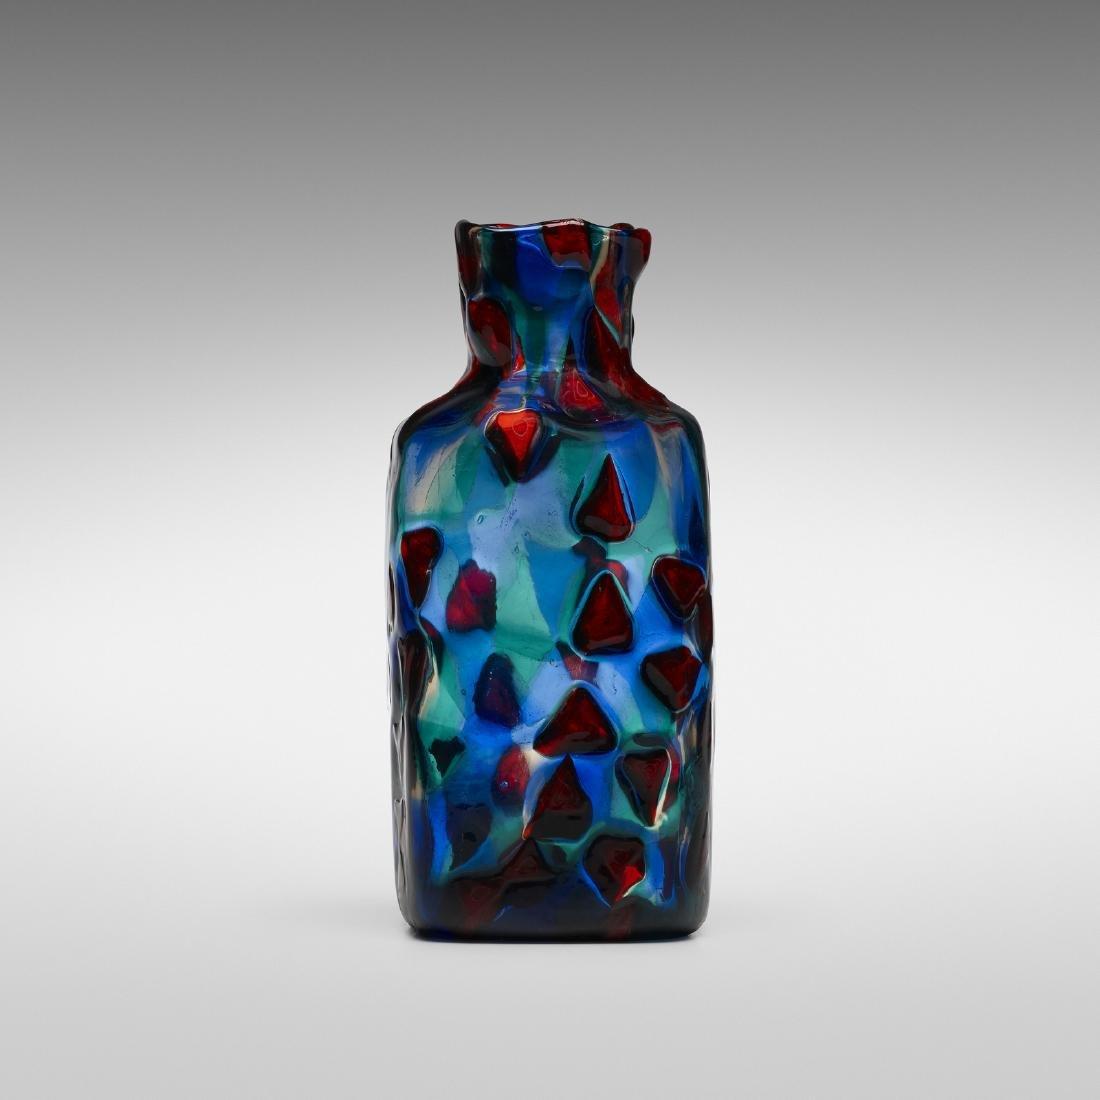 Fulvio Bianconi, Rare Pezzato vase, model 3541